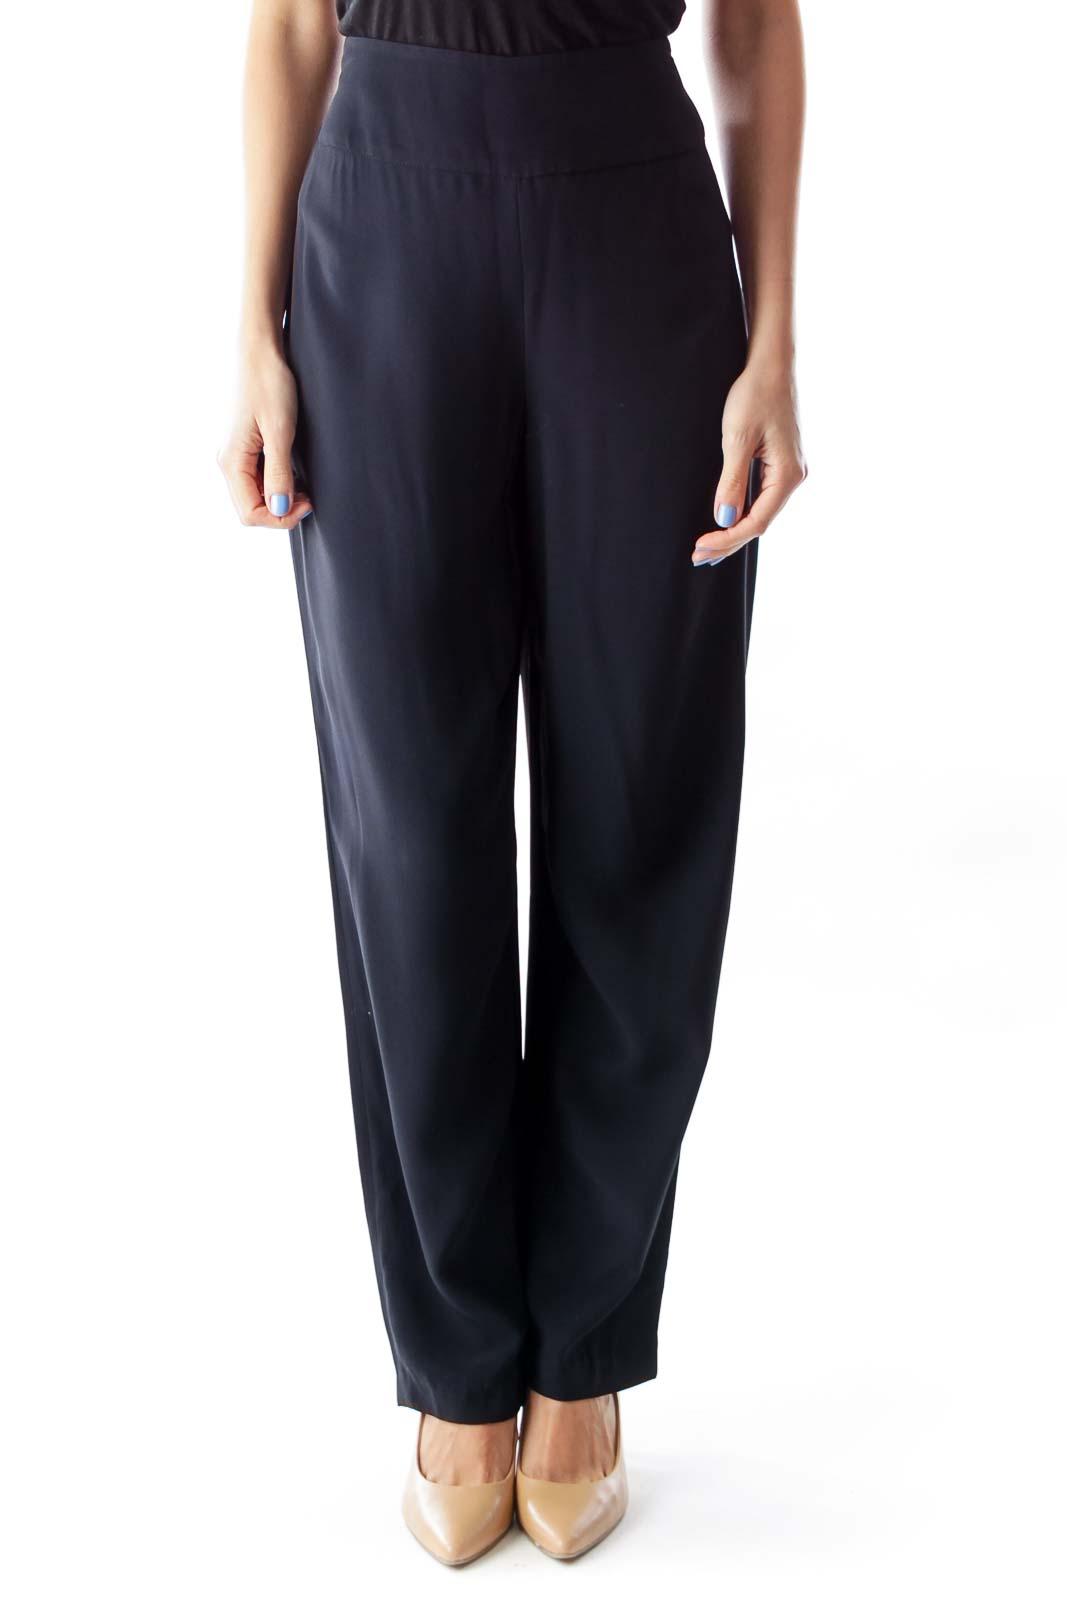 Black High Waist Pants Front